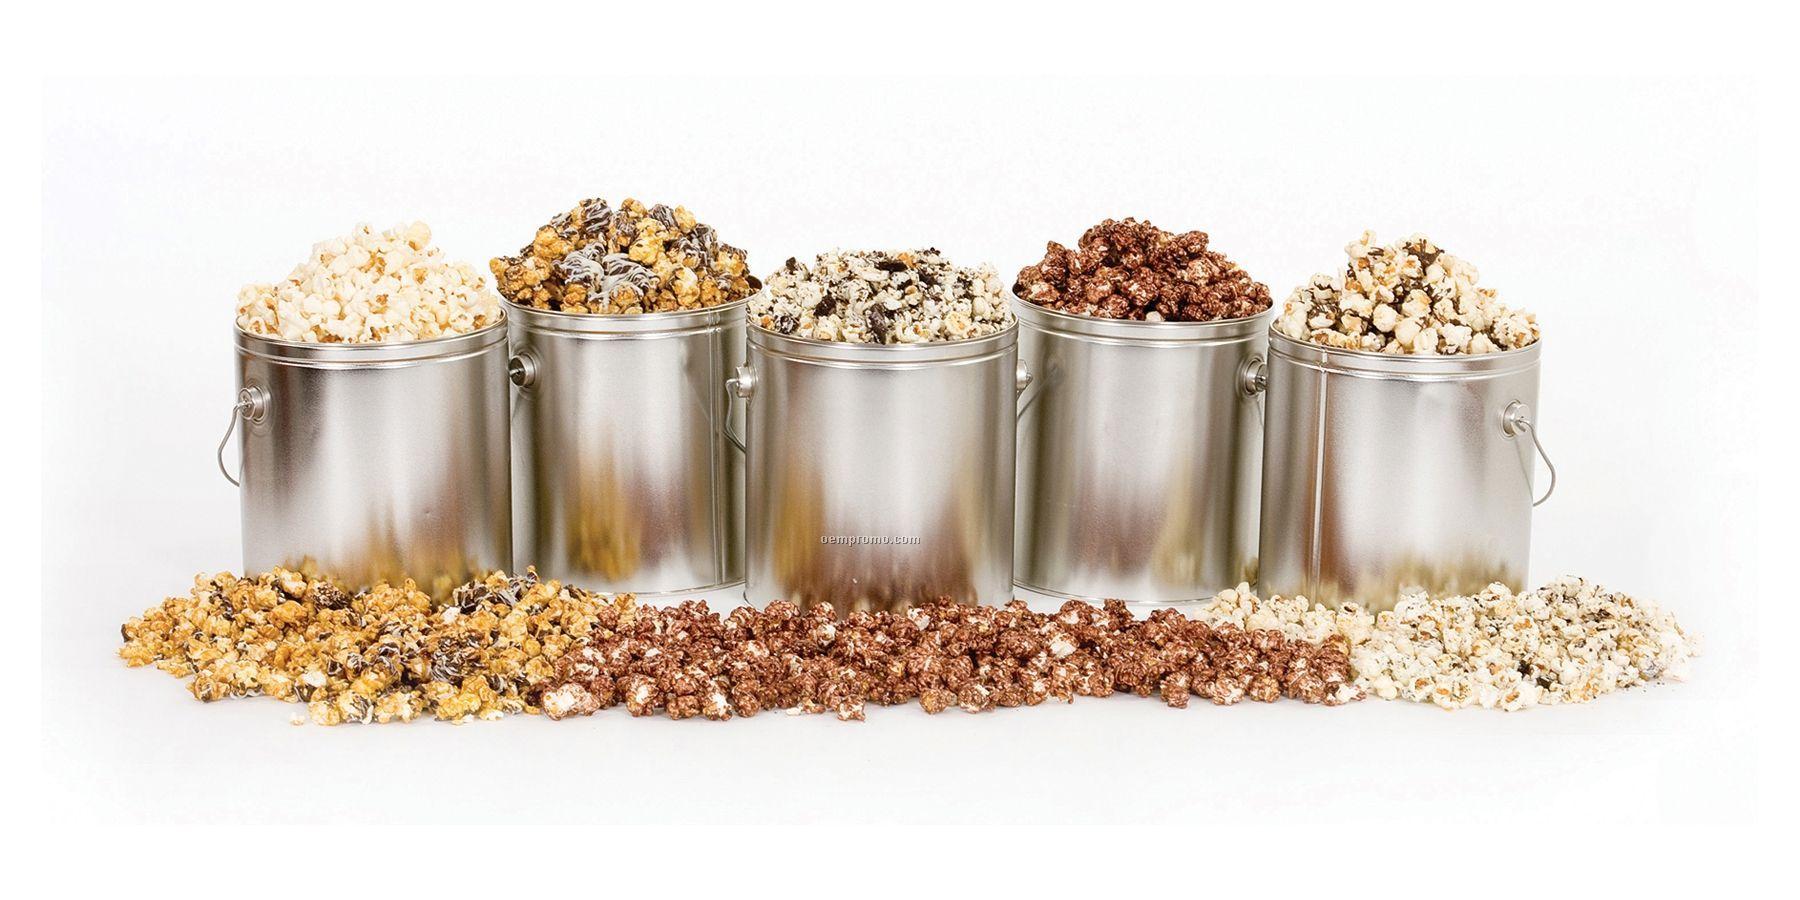 6 1/2 Gallon Caramel Chocolate Drizzle Flavored Kettle Corn